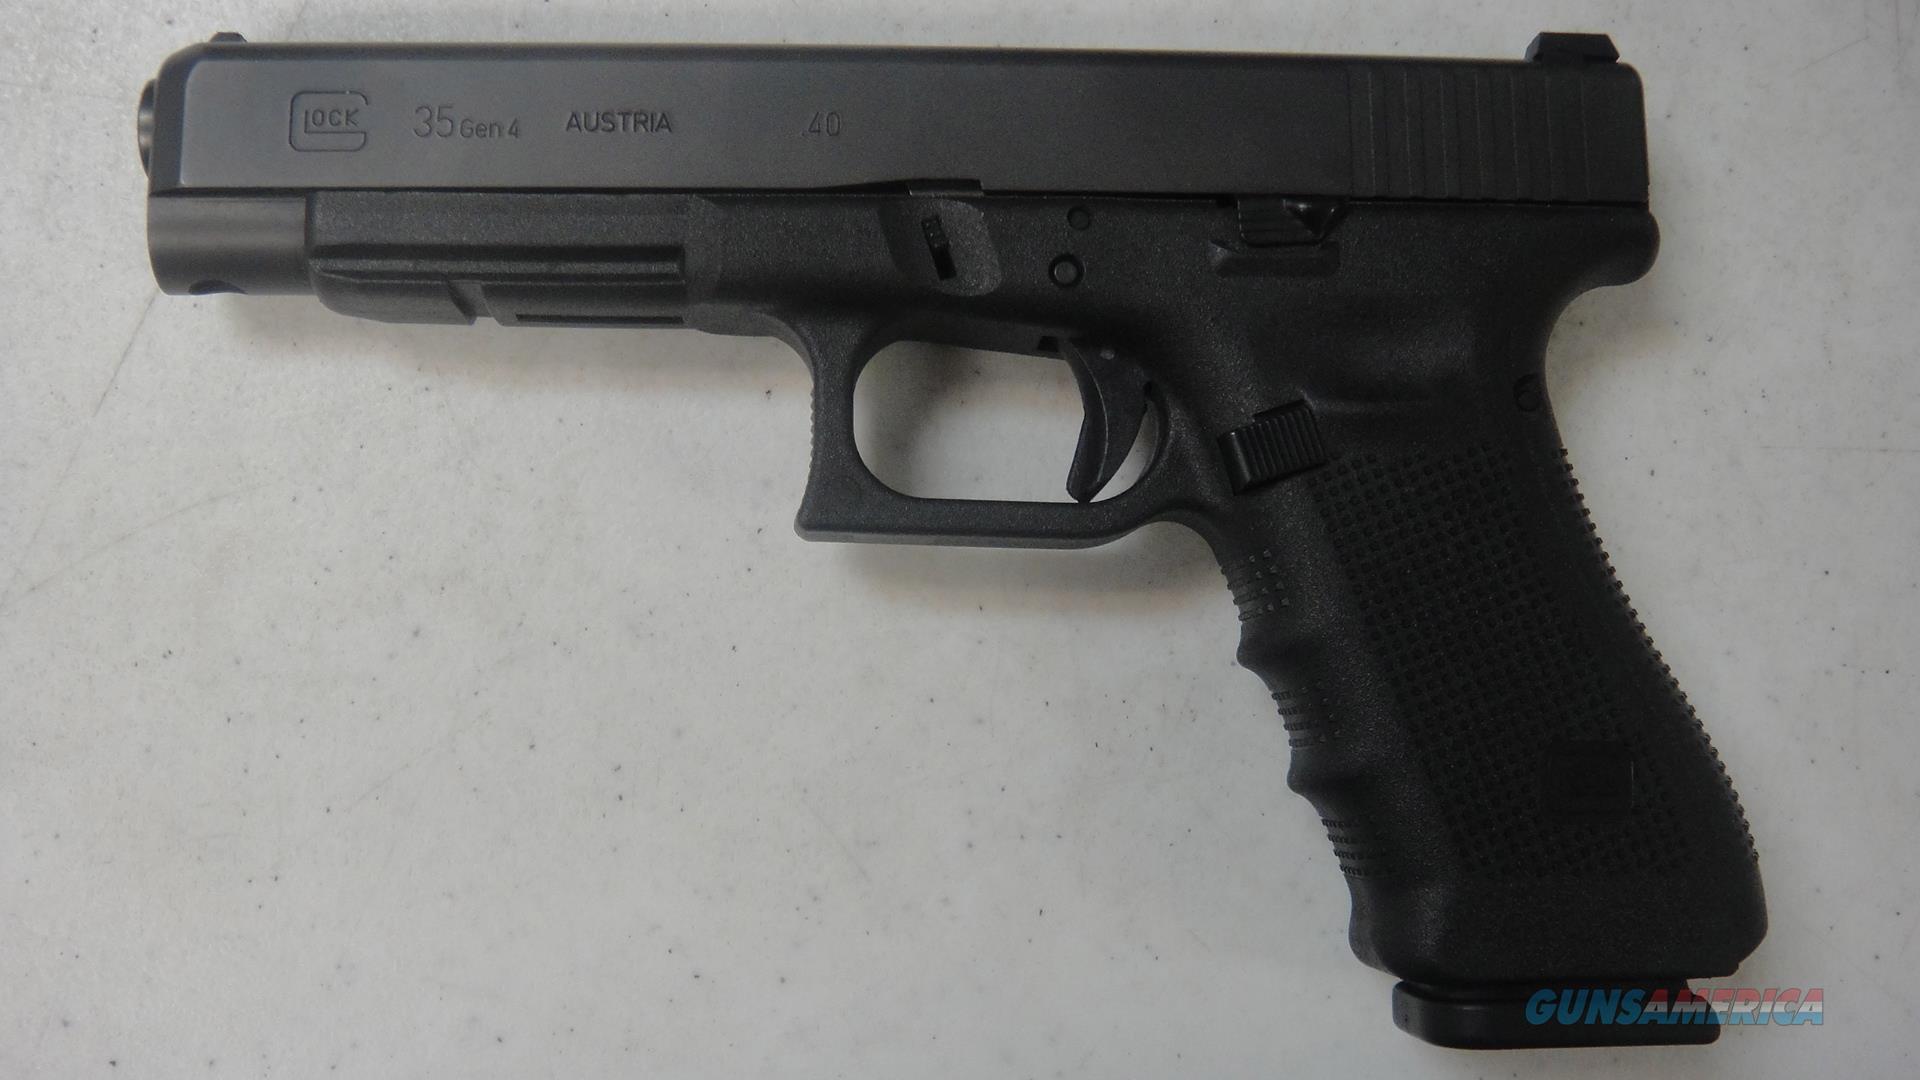 Glock 35 Gen 4  Guns > Pistols > Glock Pistols > 35